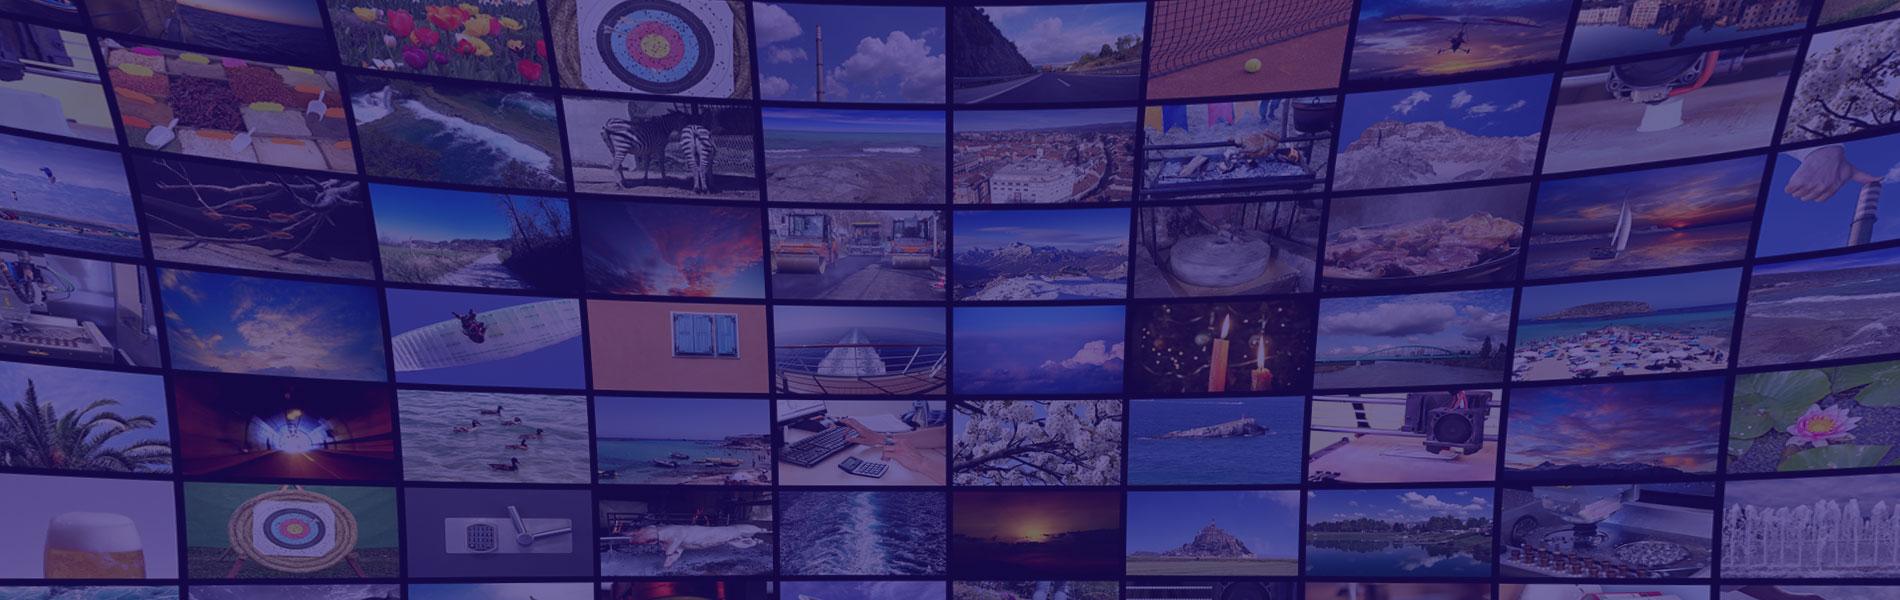 video-wall